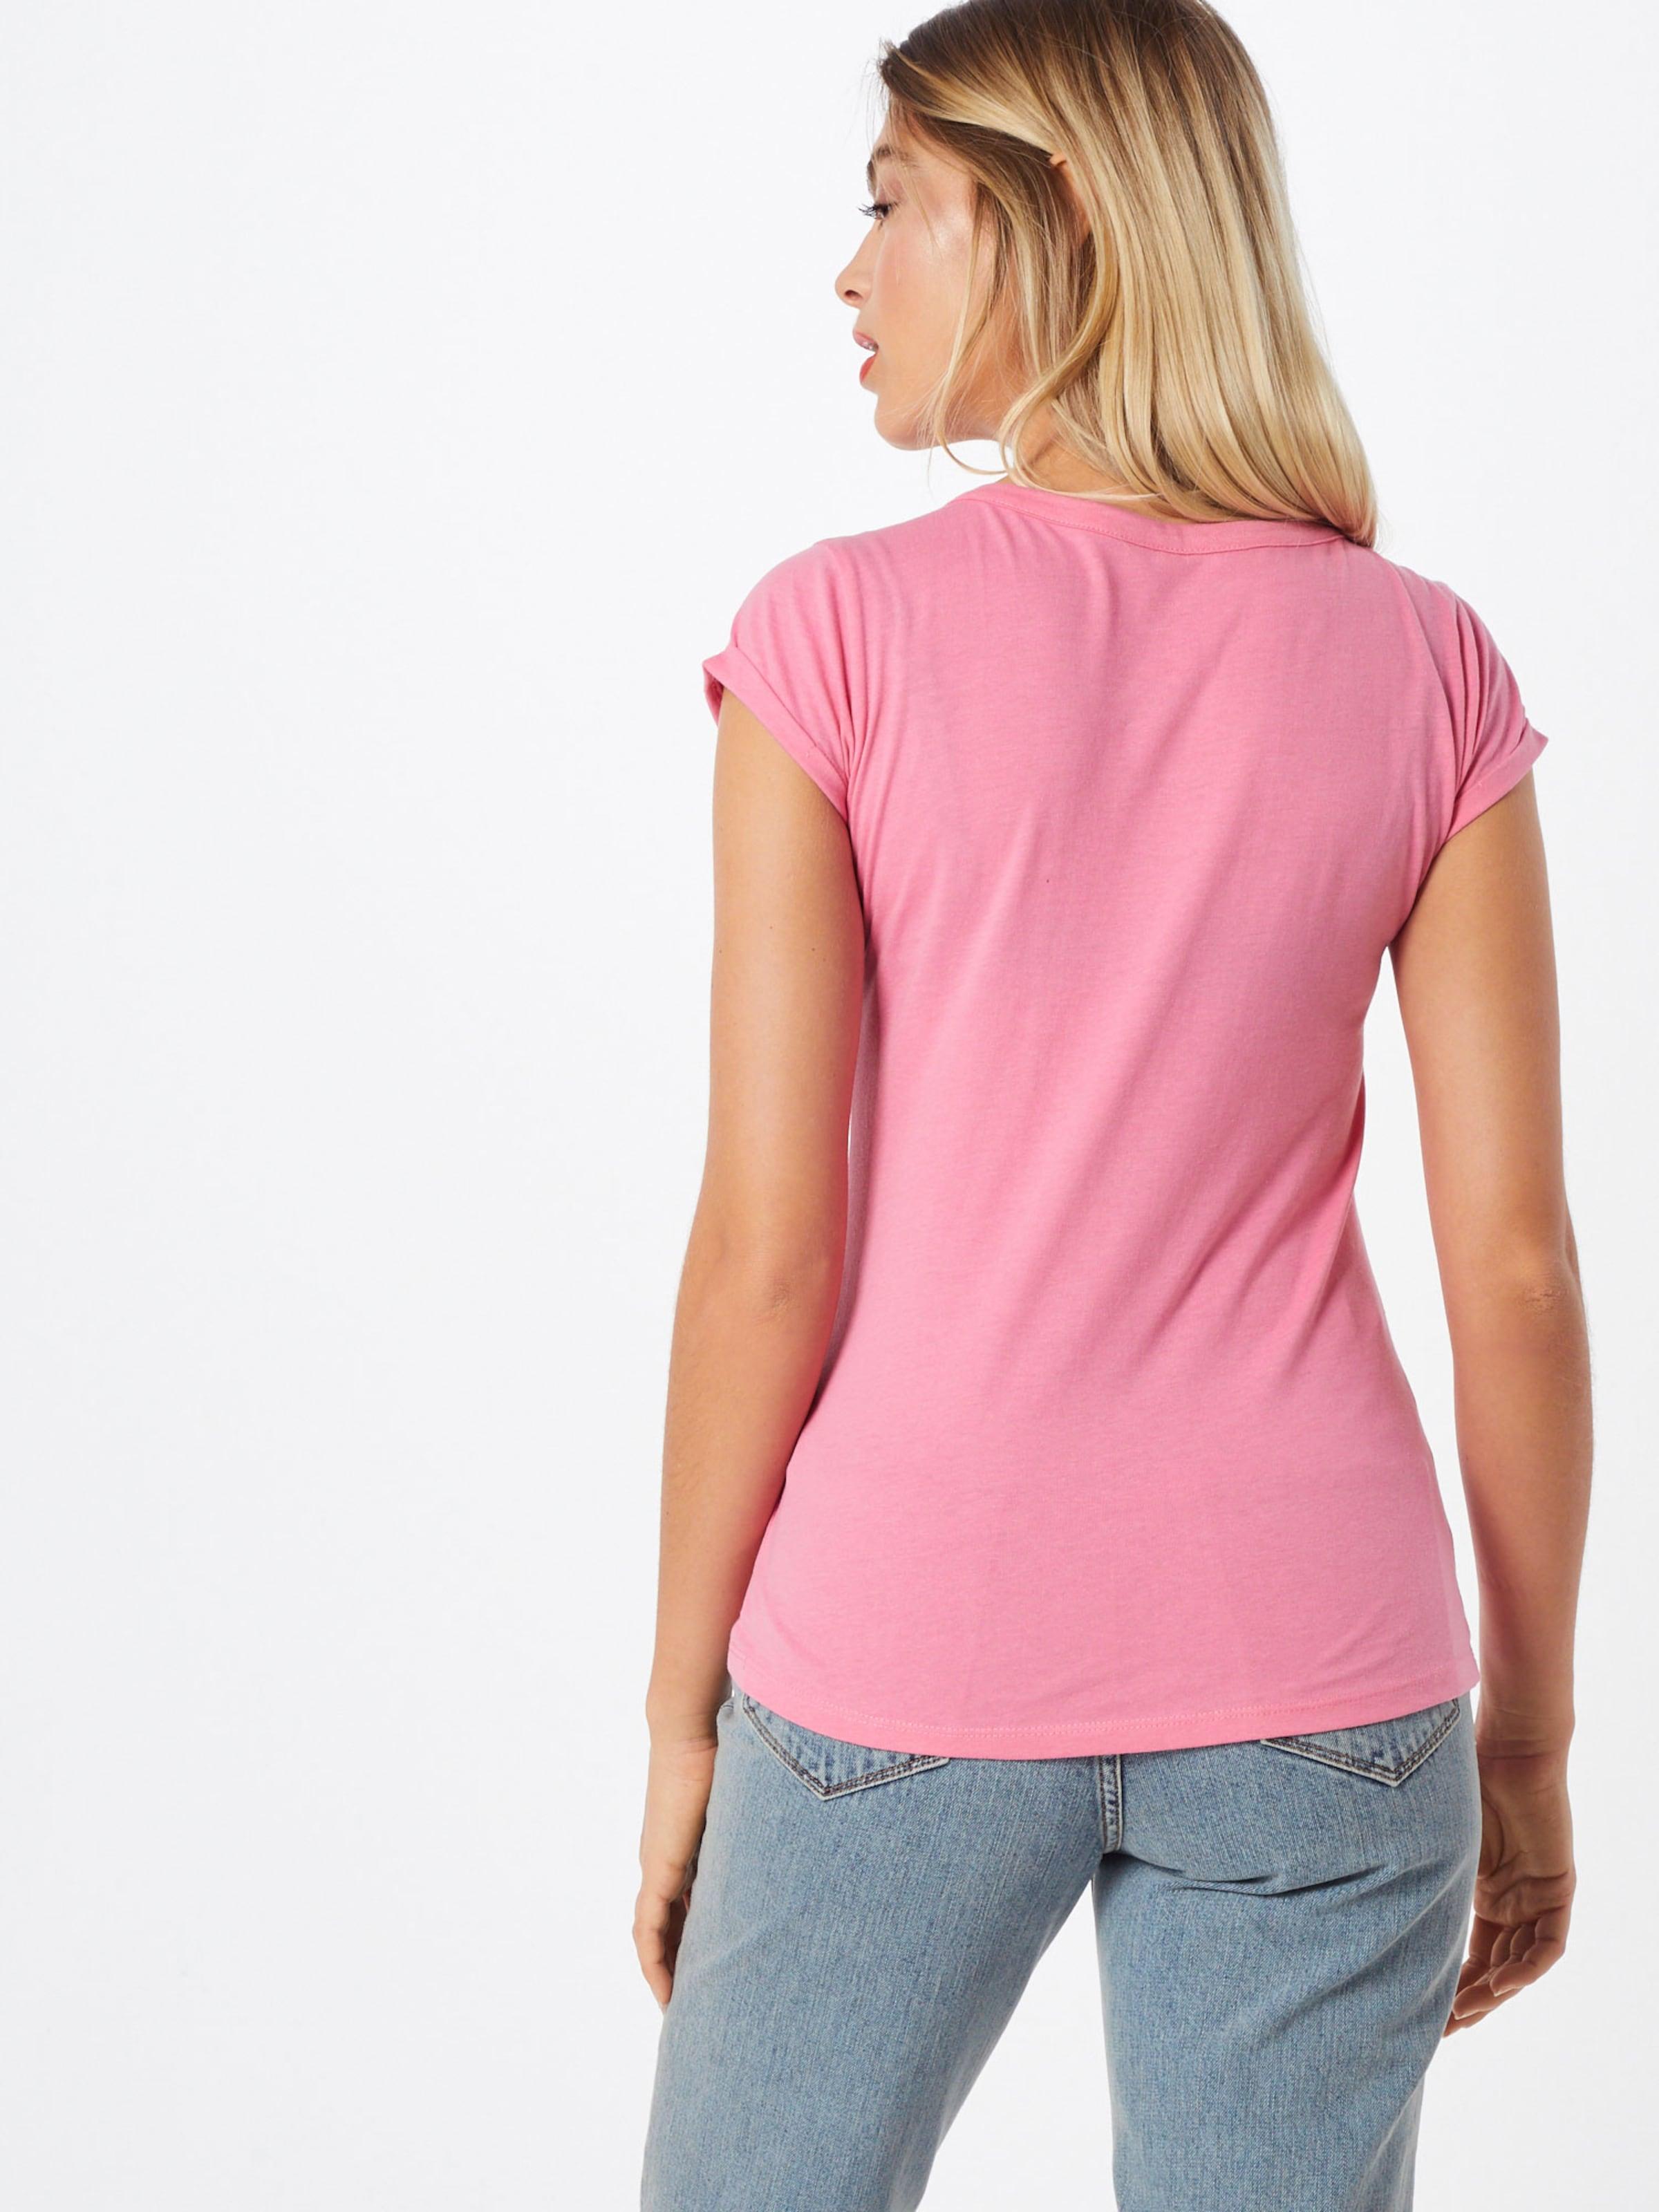 shirt Sublevel En T Rose Sublevel w8nkOXN0P